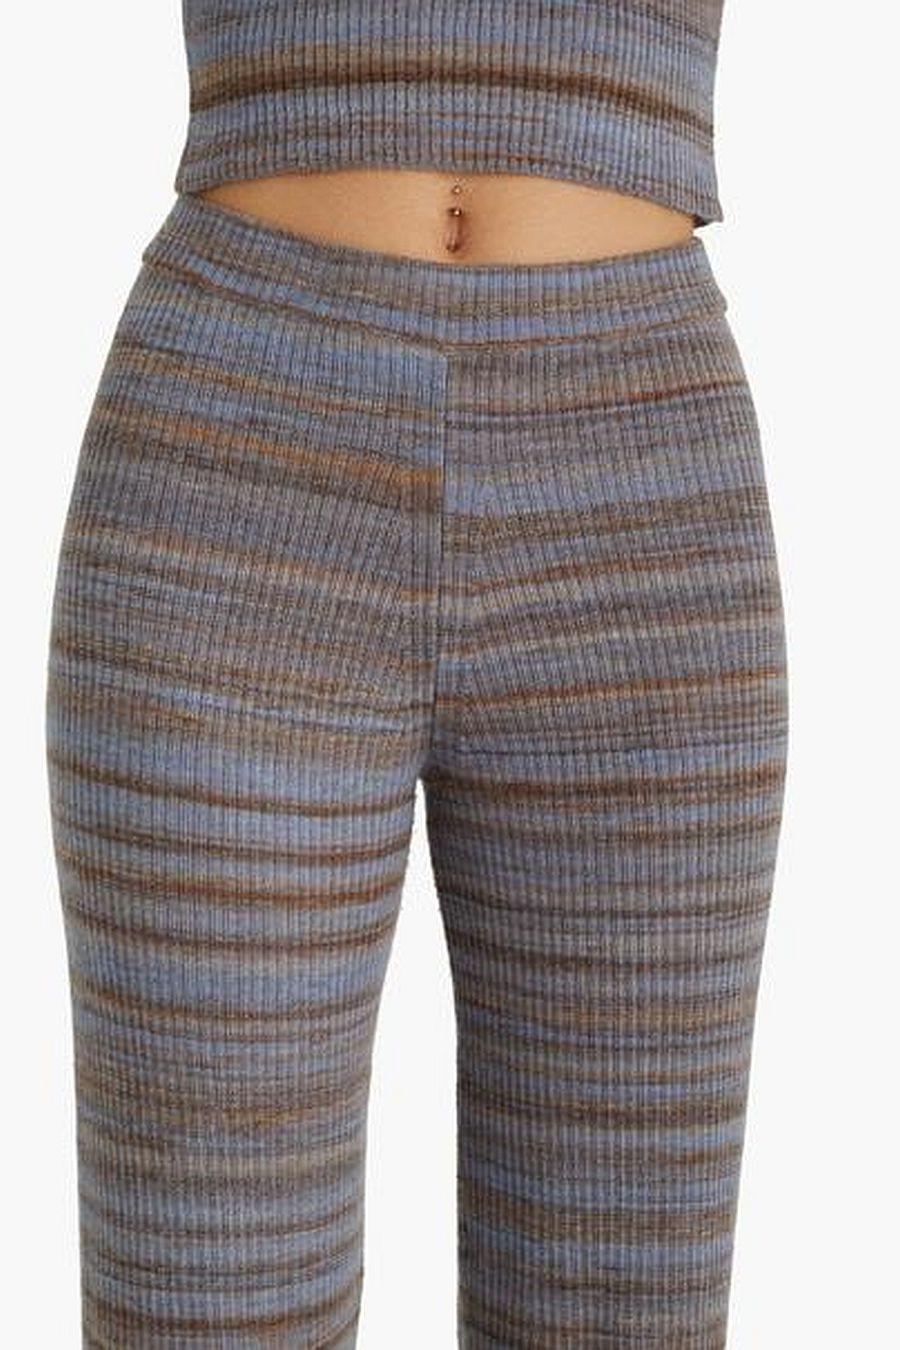 Paloma Wool Fabia Pants - Greyish Blue